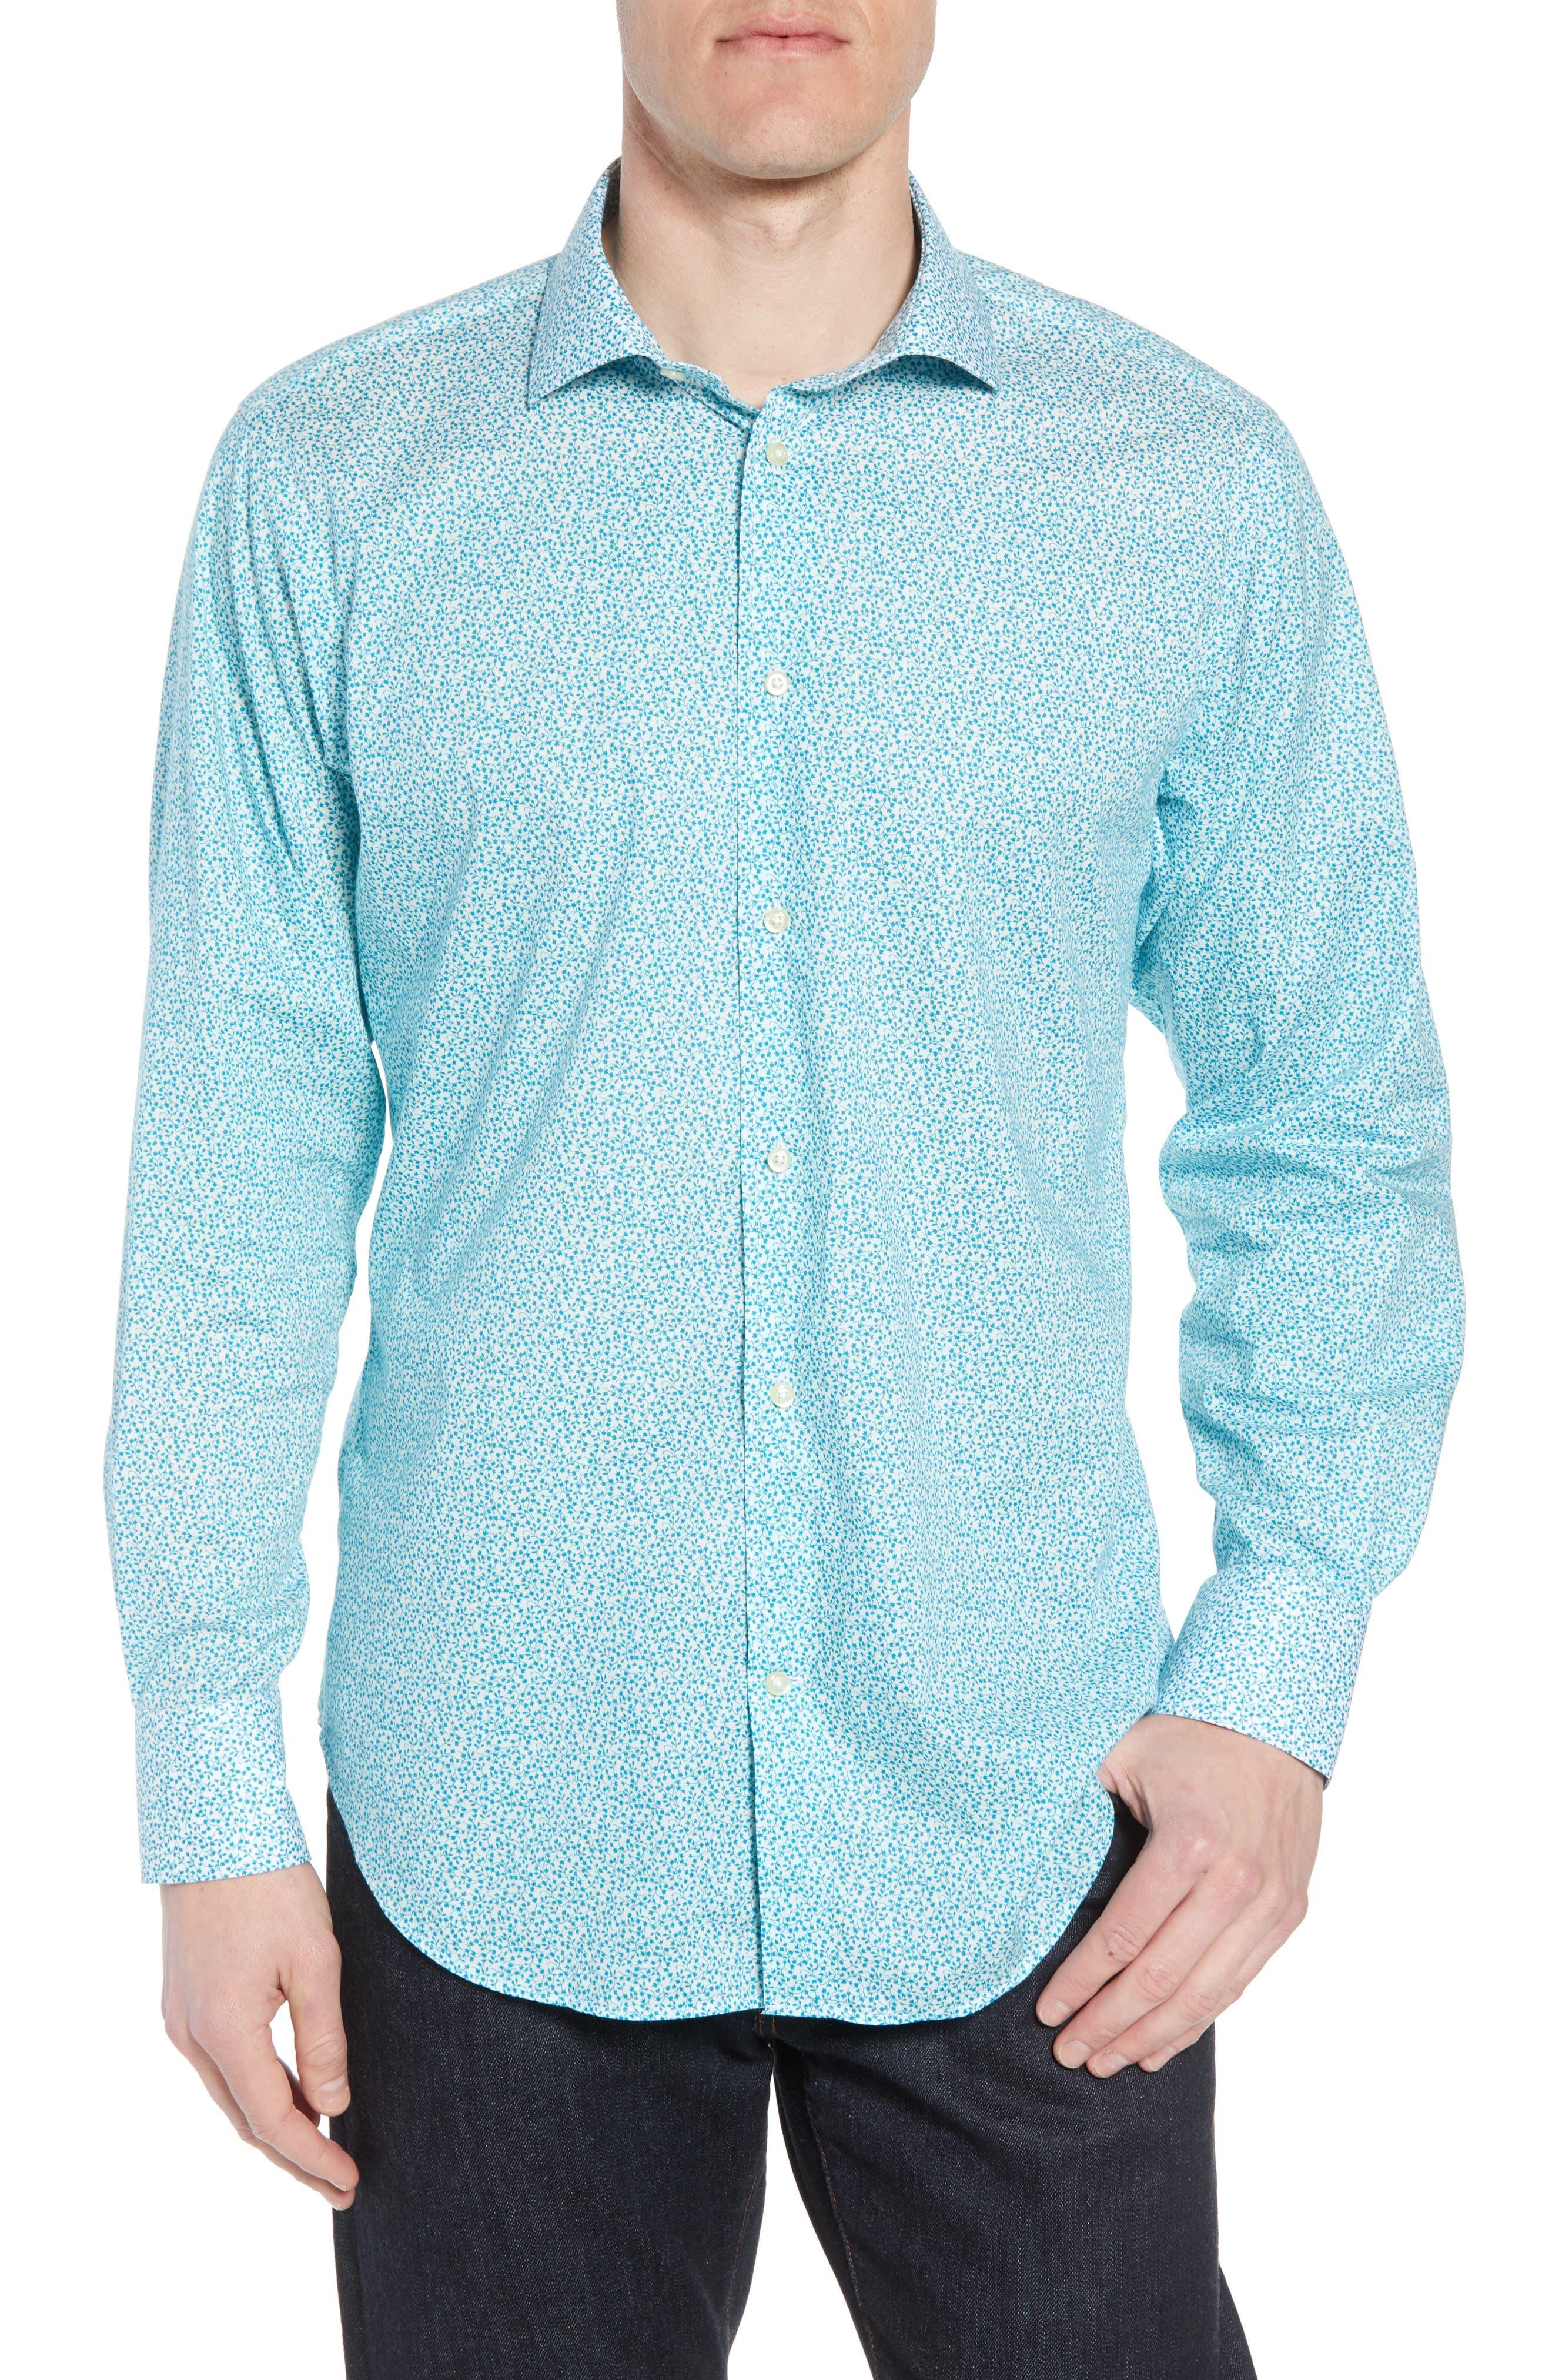 THOMAS DEAN Regular Fit Floral Print Sport Shirt, Main, color, 300